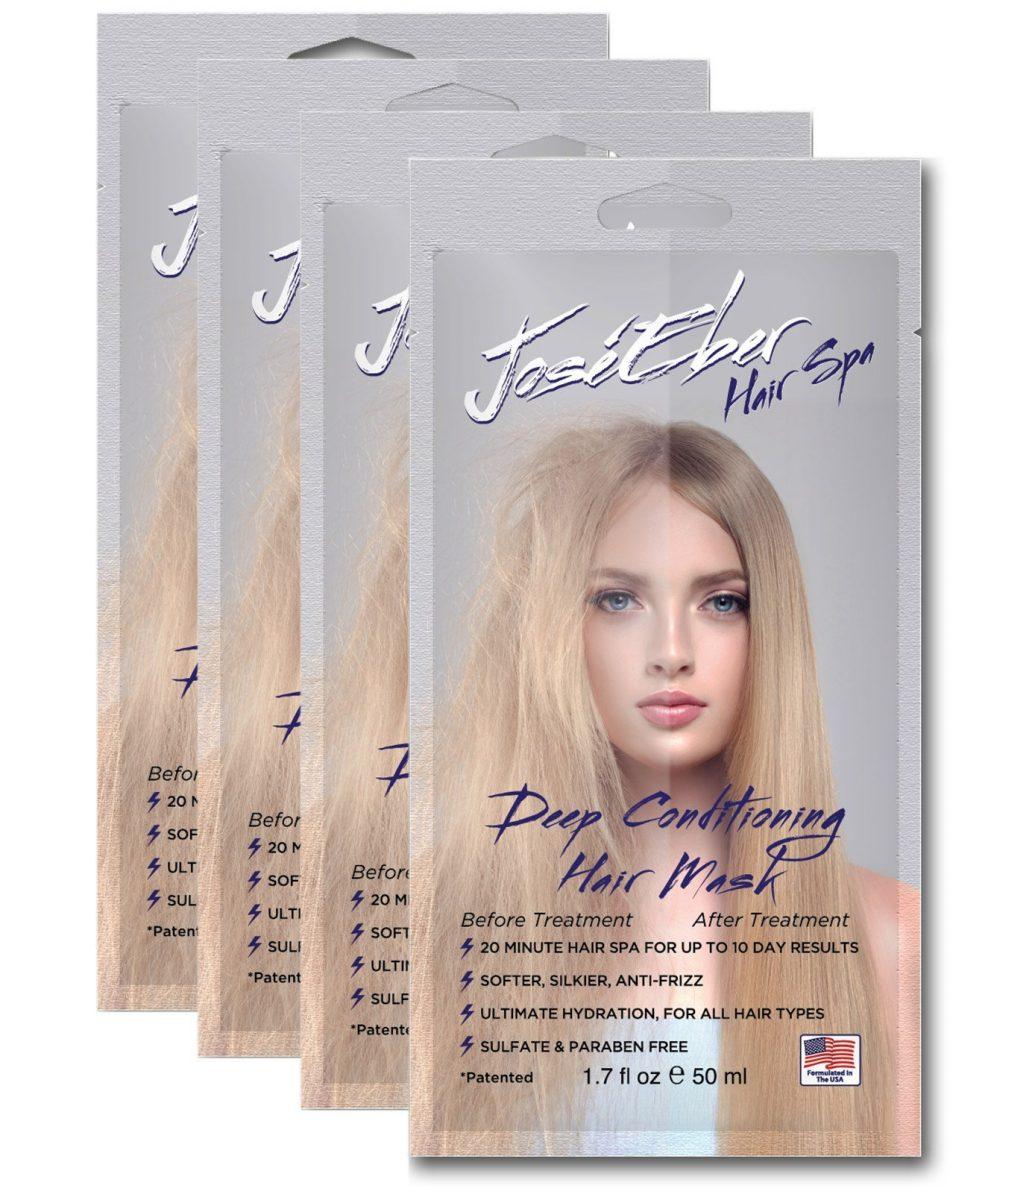 Jose Eber Hair Mask Deep Conditioning Hair Mask